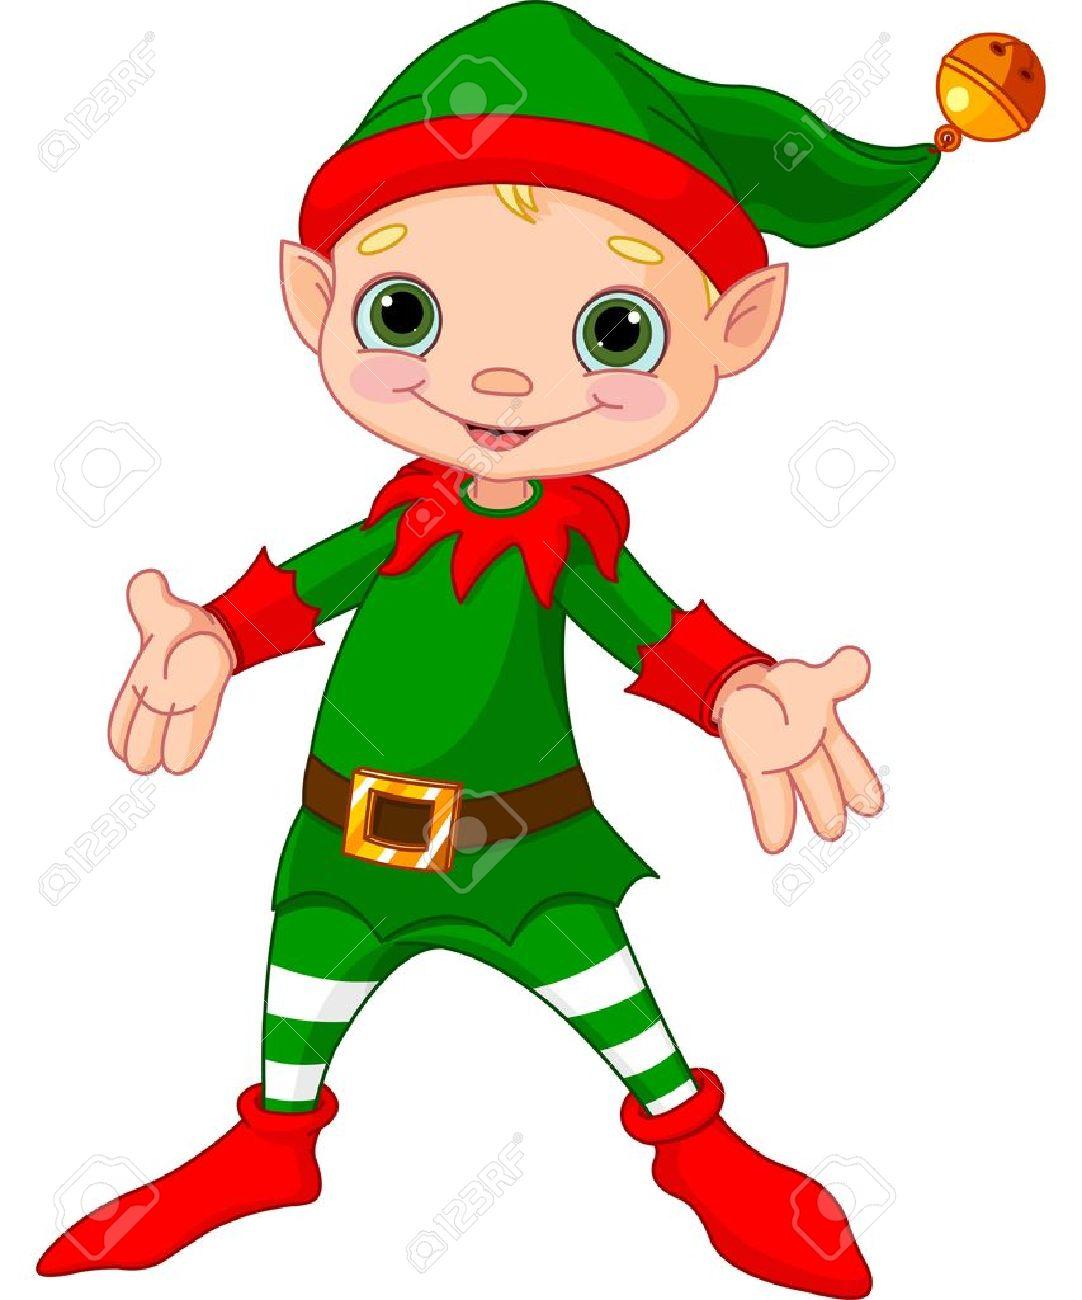 Illustration of happy Christmas Elf Stock Vector - 16373929